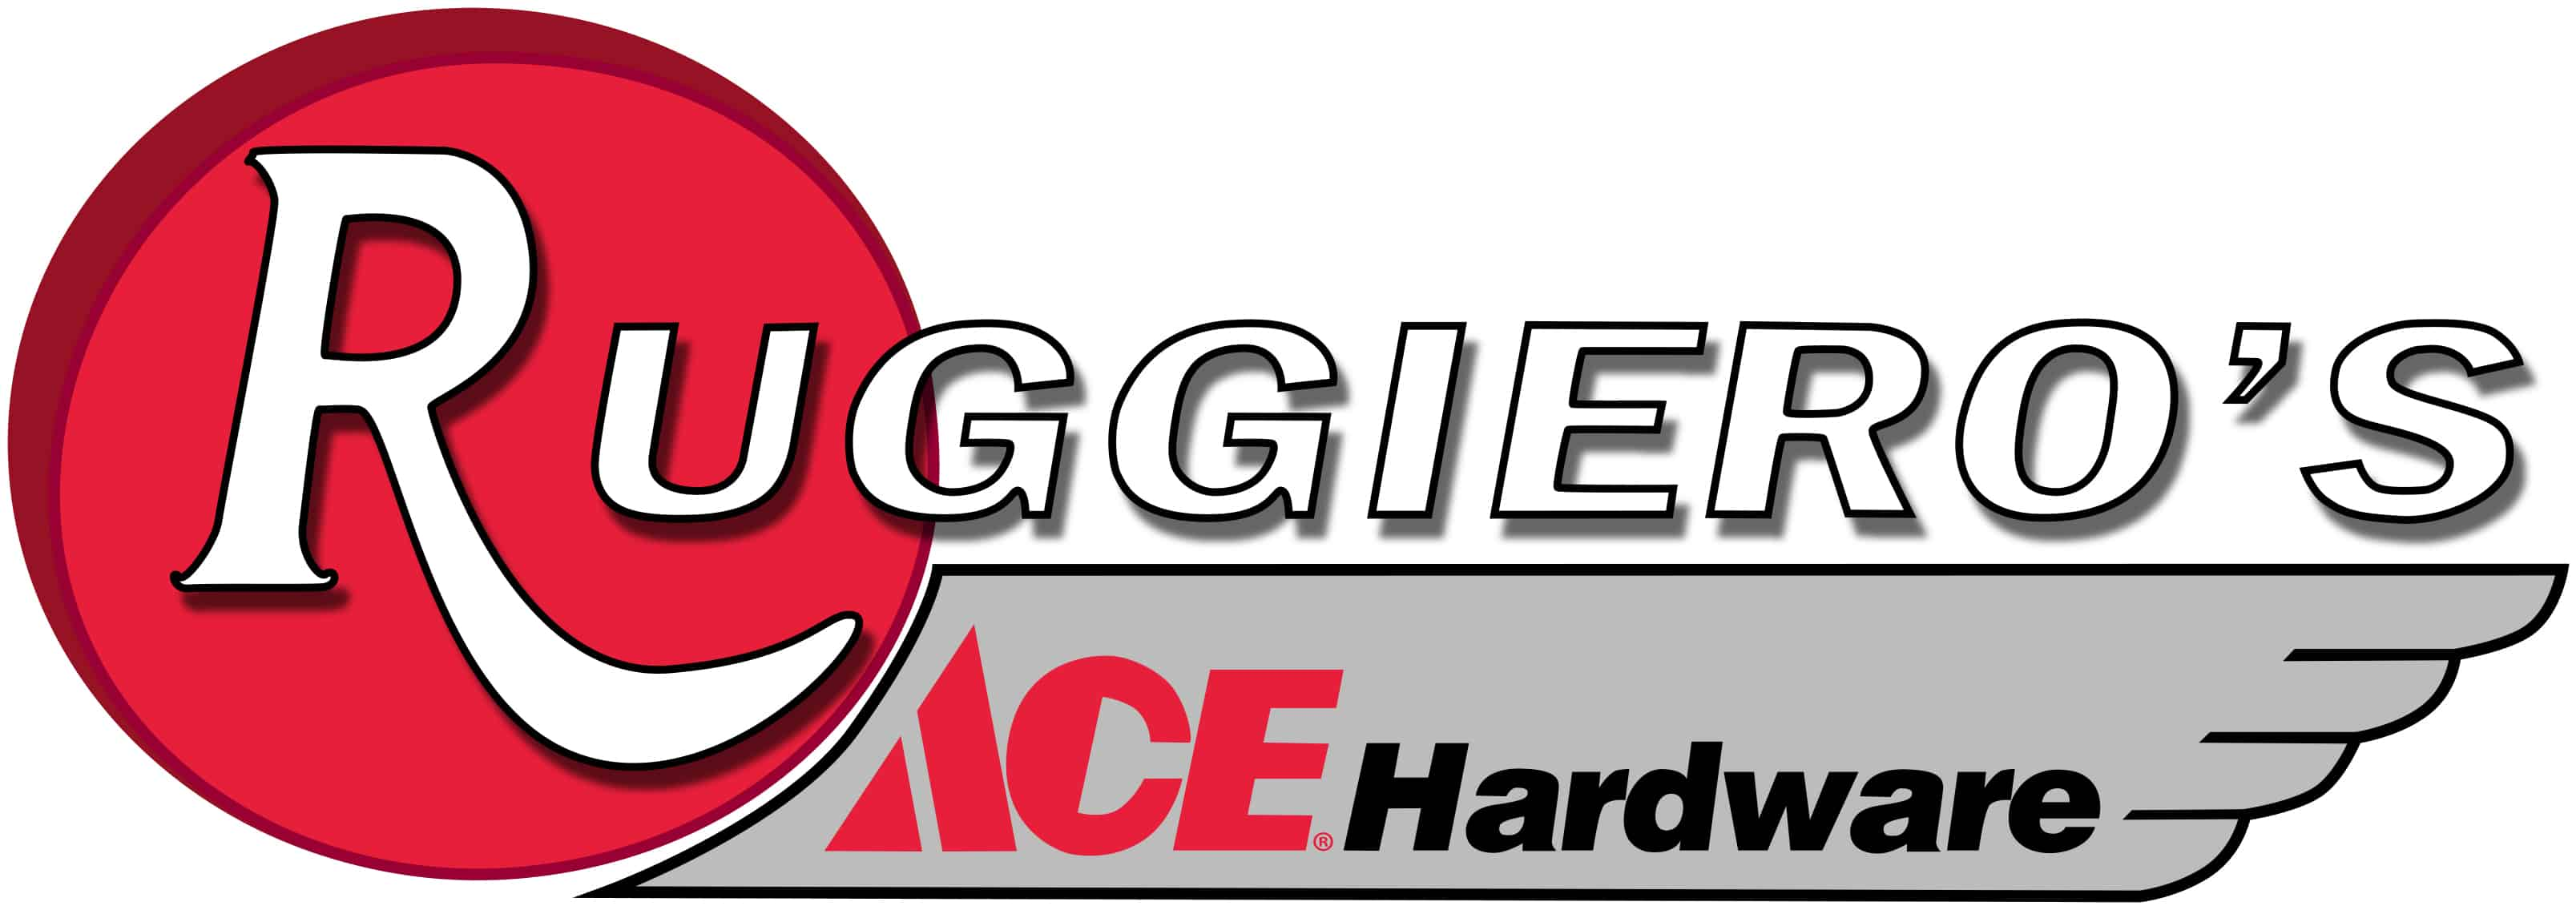 Ruggiero Ace Hardware